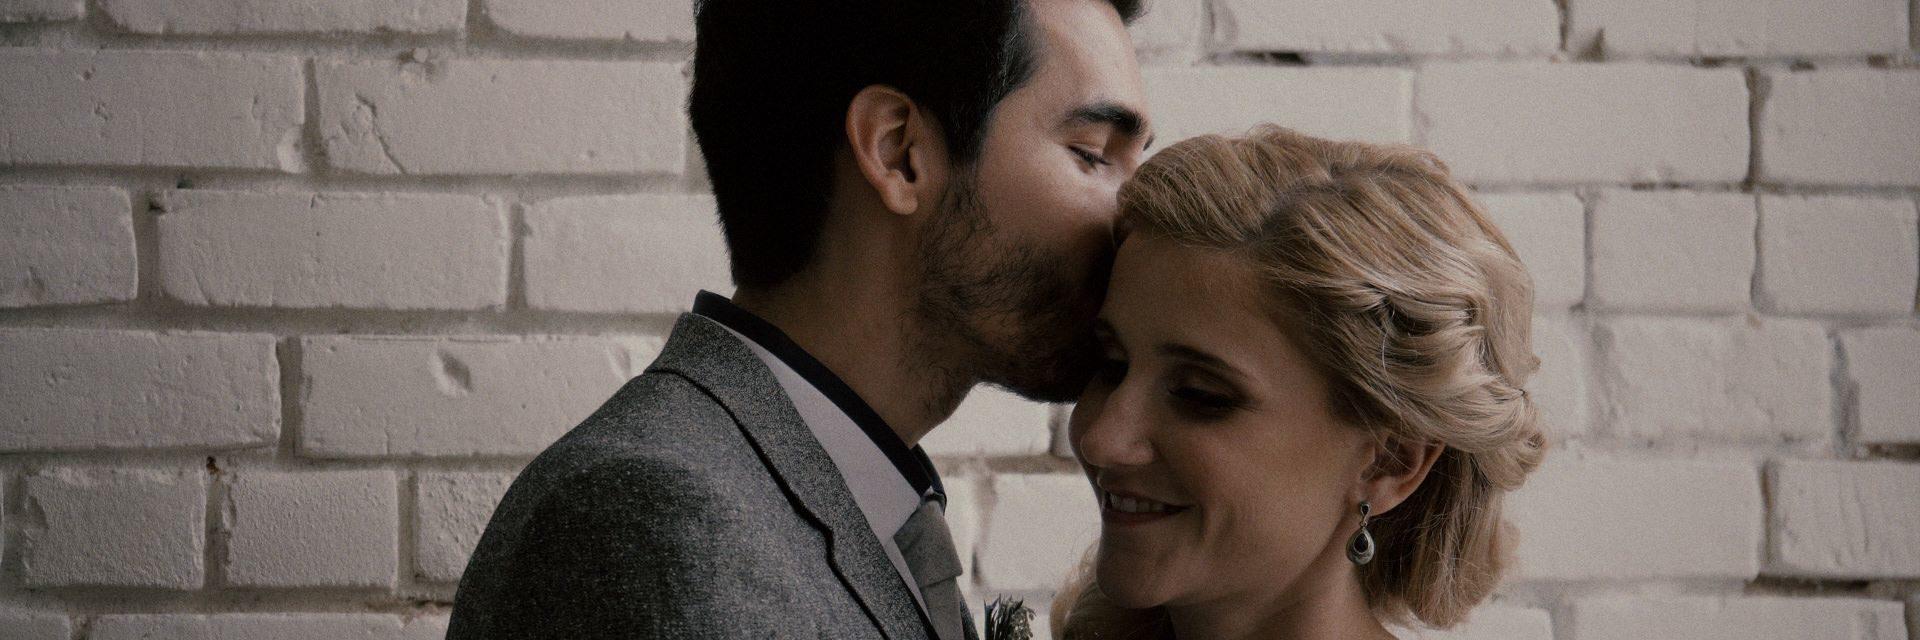 Piedmont-wedding-videographer-cinemate-films-03